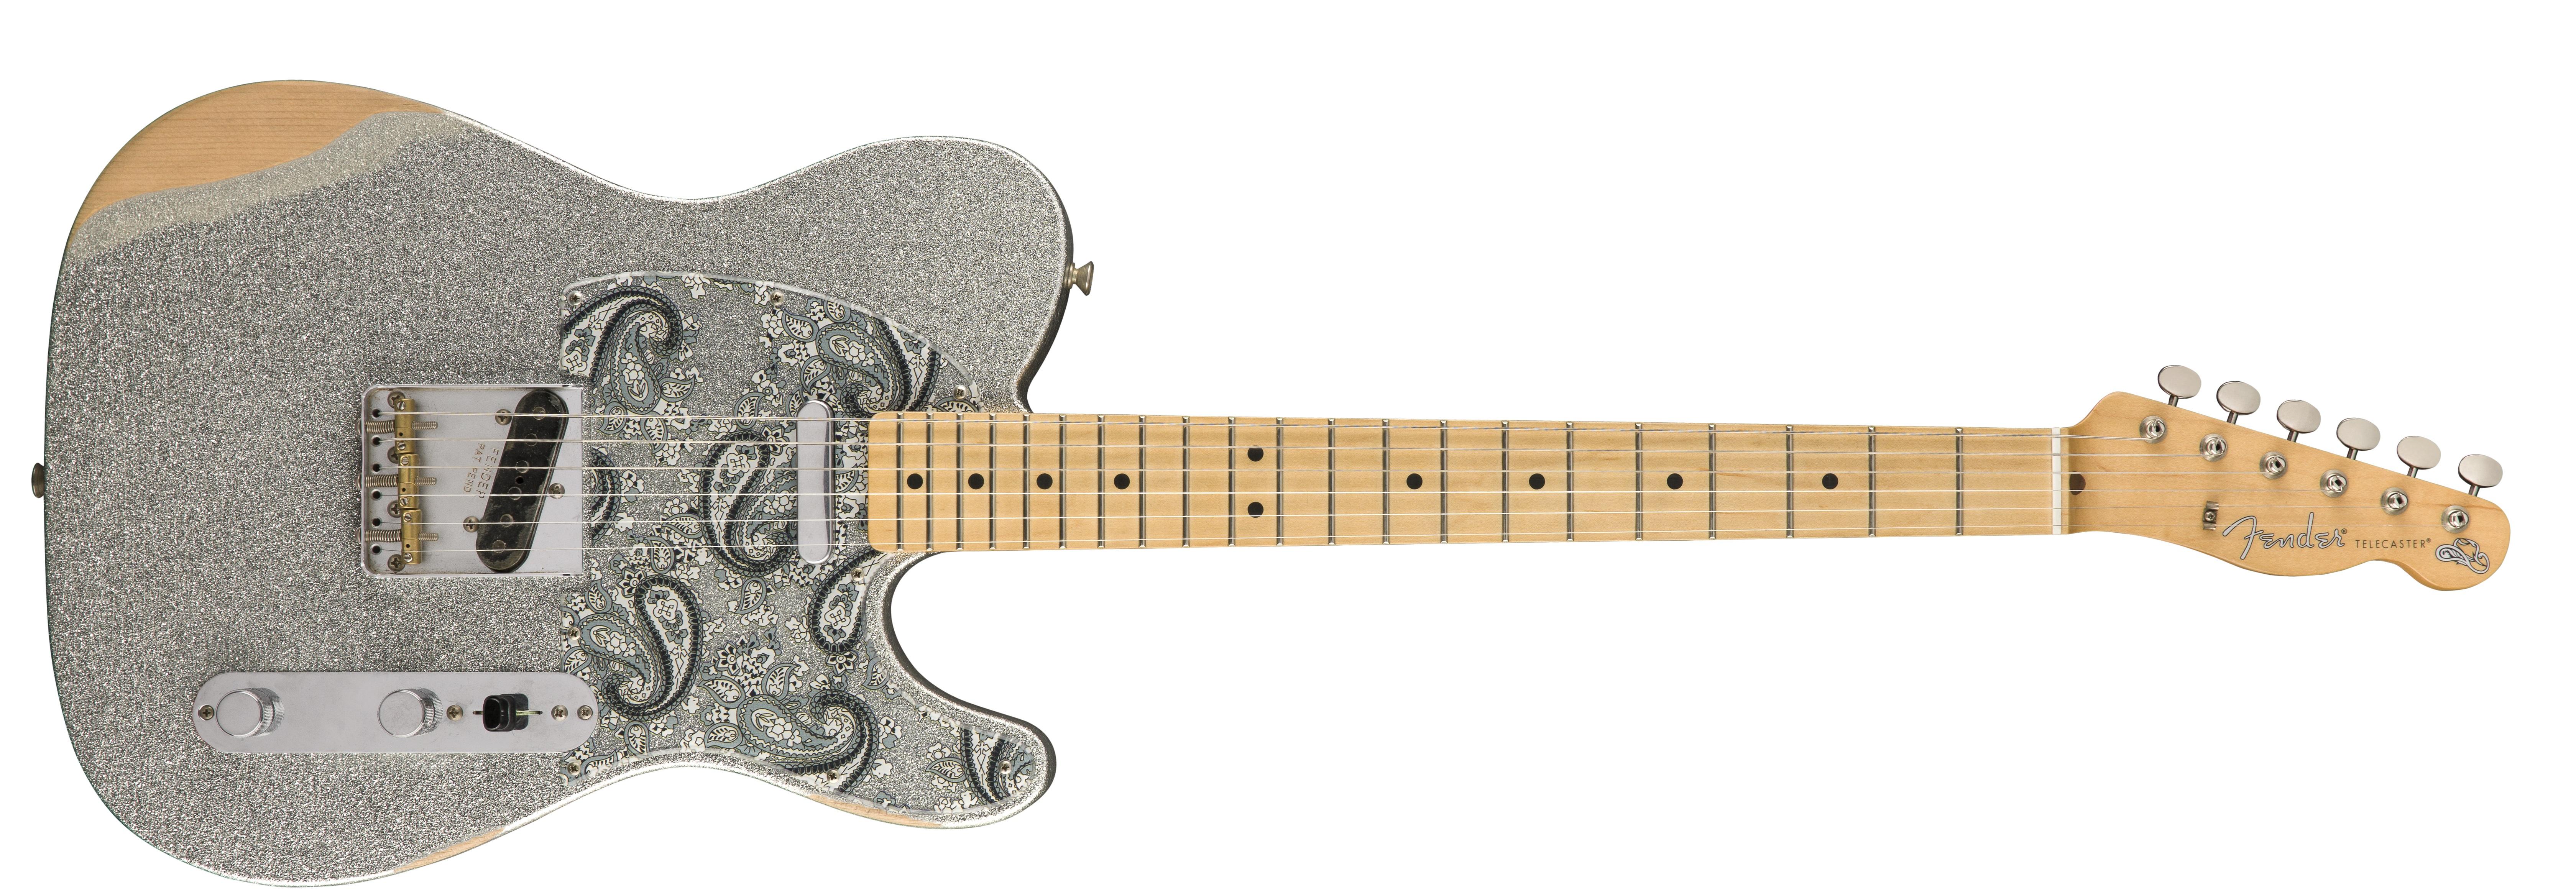 Brad Paisley Road Worn® Telecaster®; Photo courtesy Bieber Public Relations/Fender PR